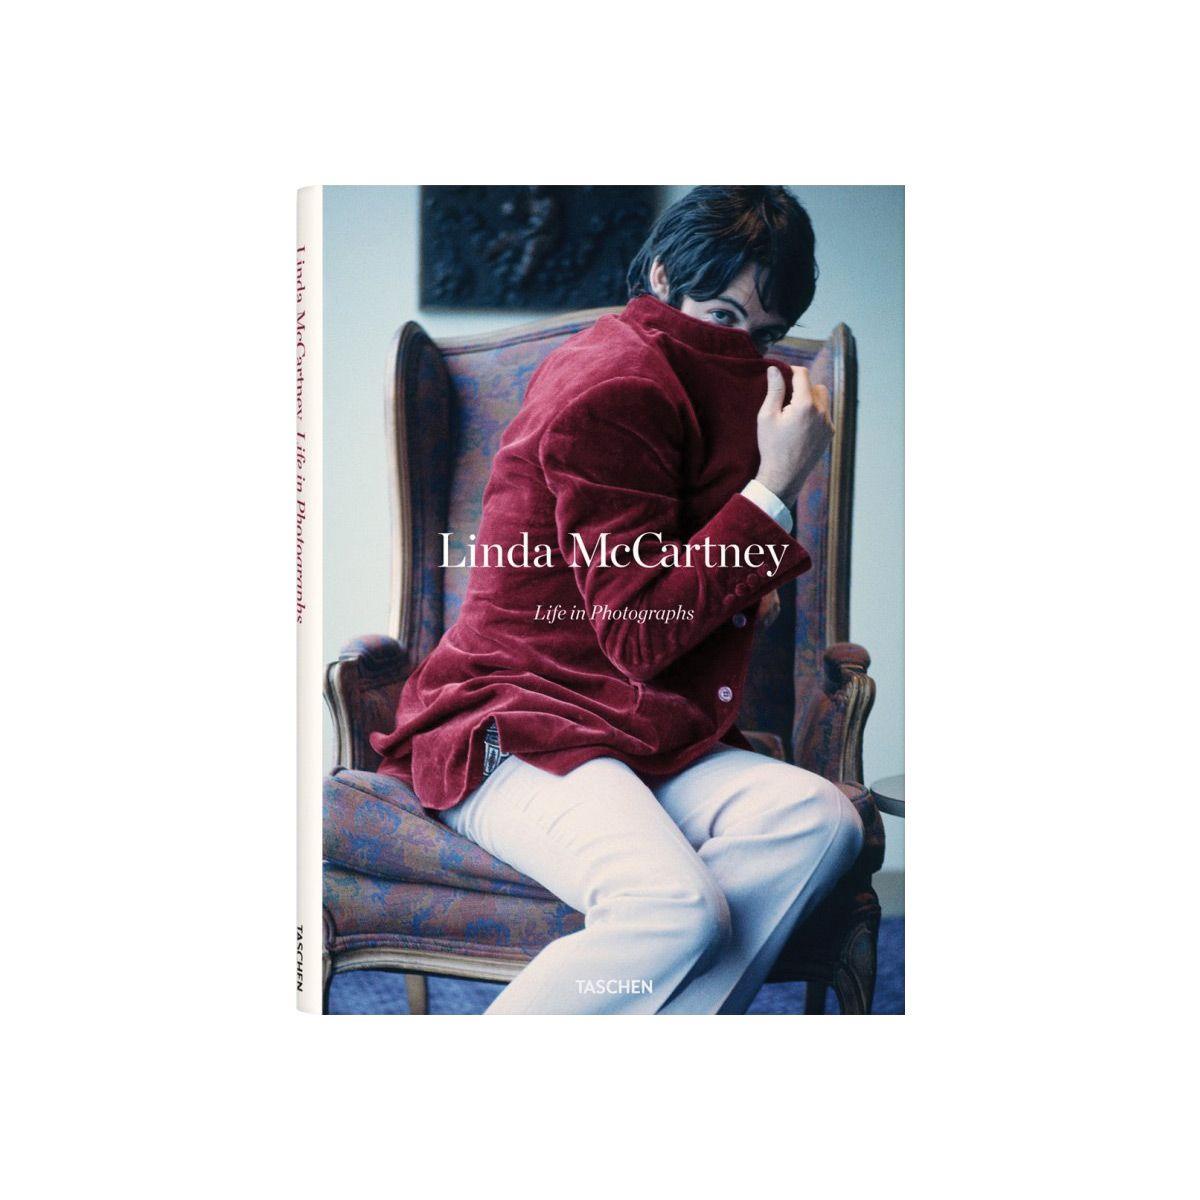 Livro Linda McCartney Life in Photographs